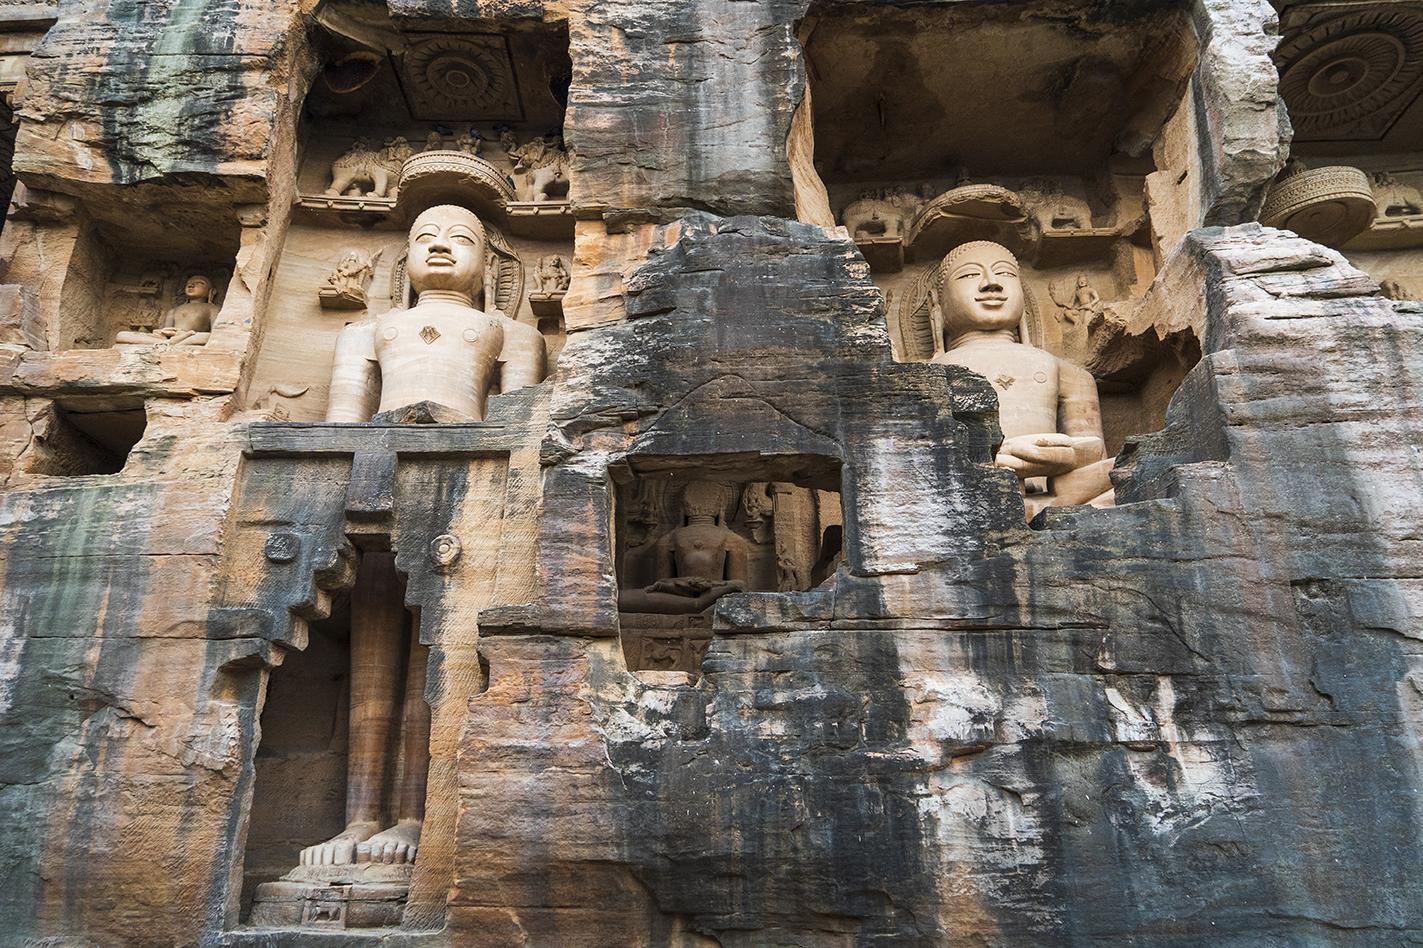 Ek Patthar Ki Bawadi group also known as 'Gopachal Atishya Kshetra' has 26 rock-cut caves in its cluster